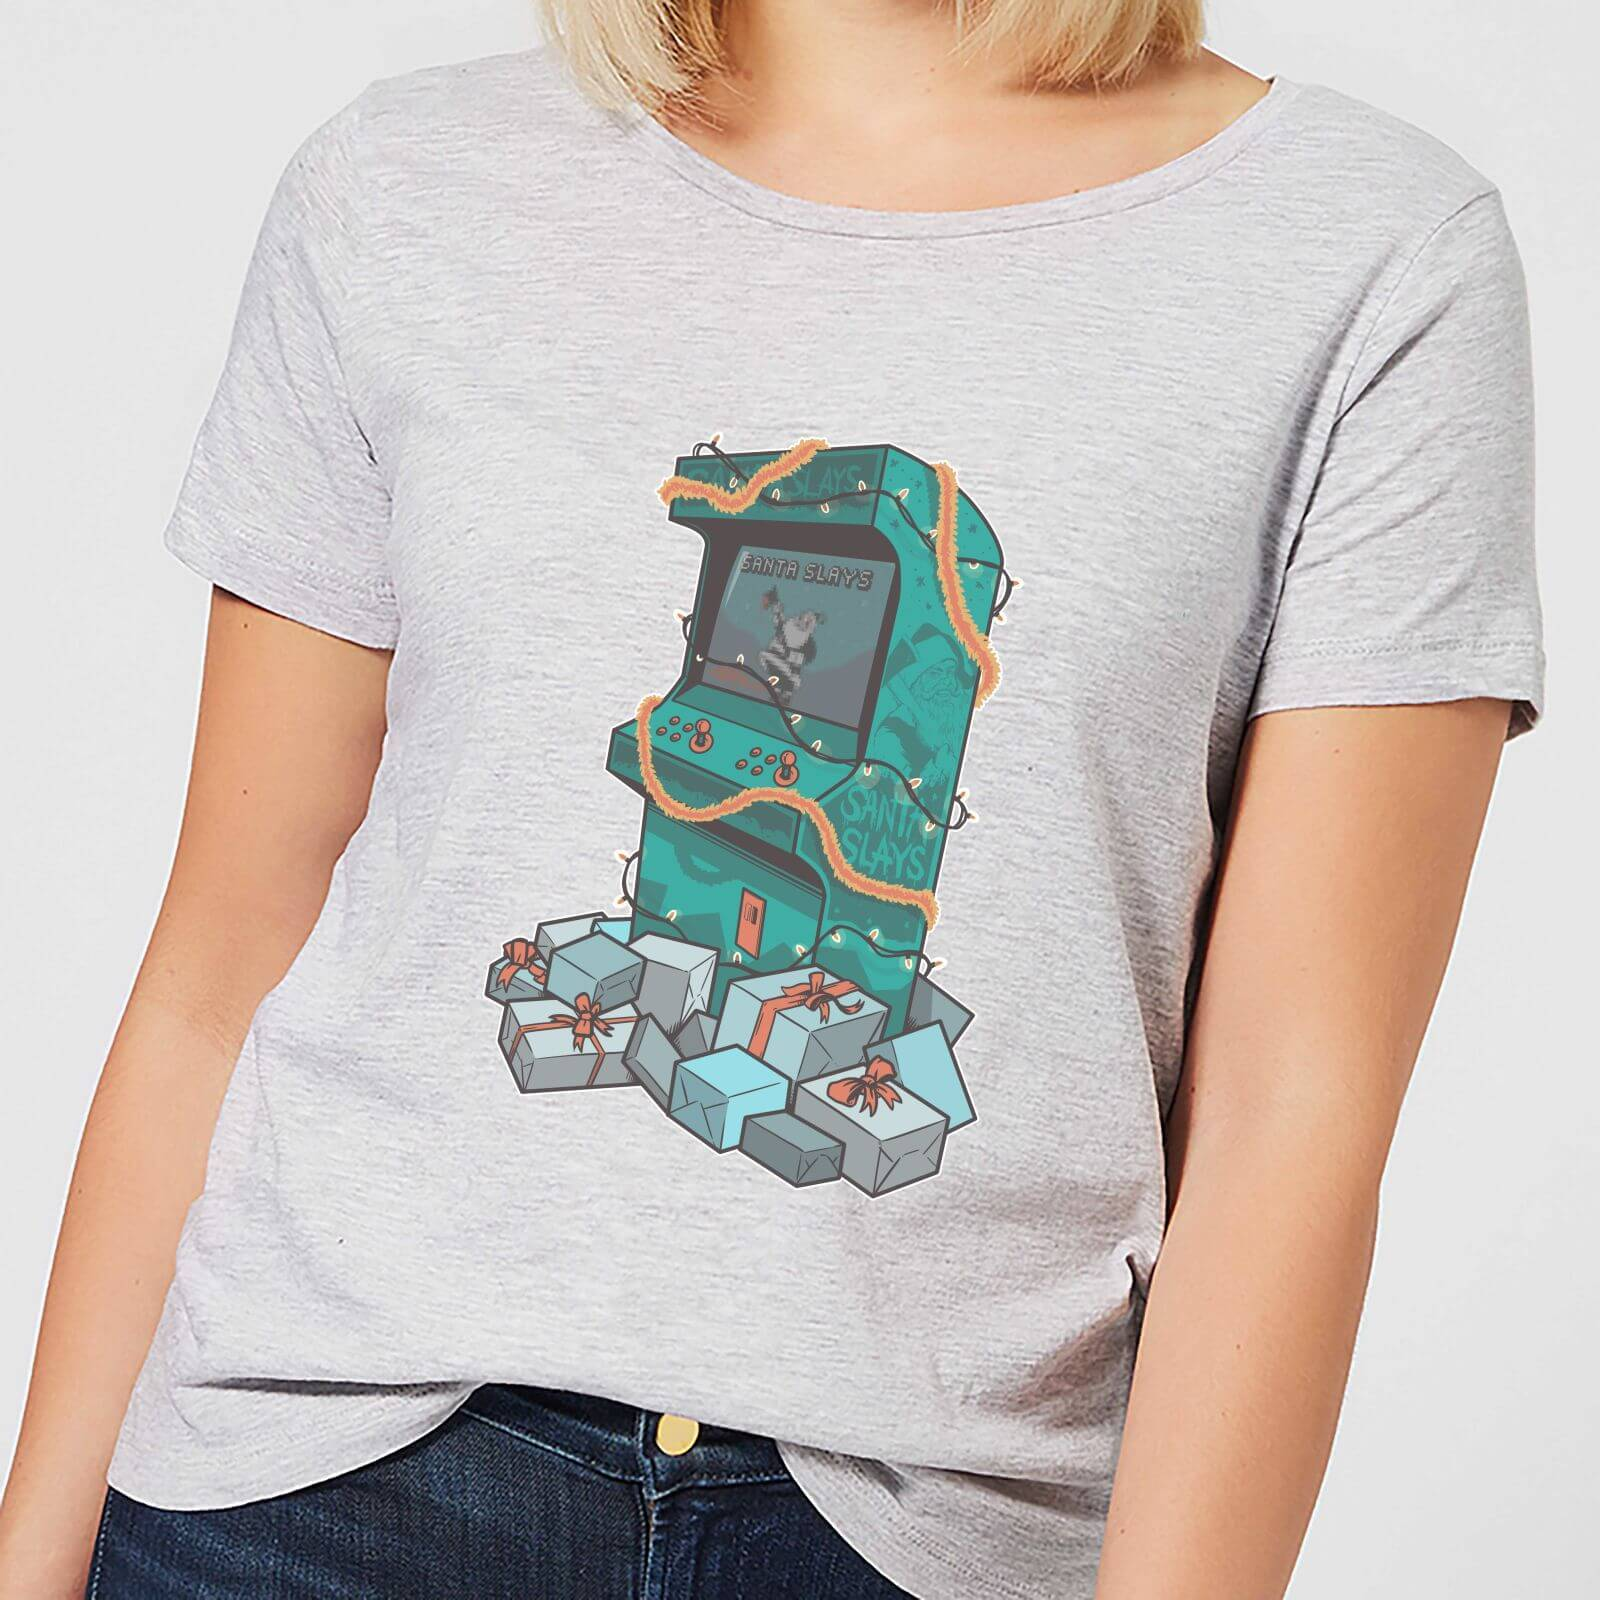 Geek Christmas Arcade Tress Women's T-Shirt - Grey - XL - Grey